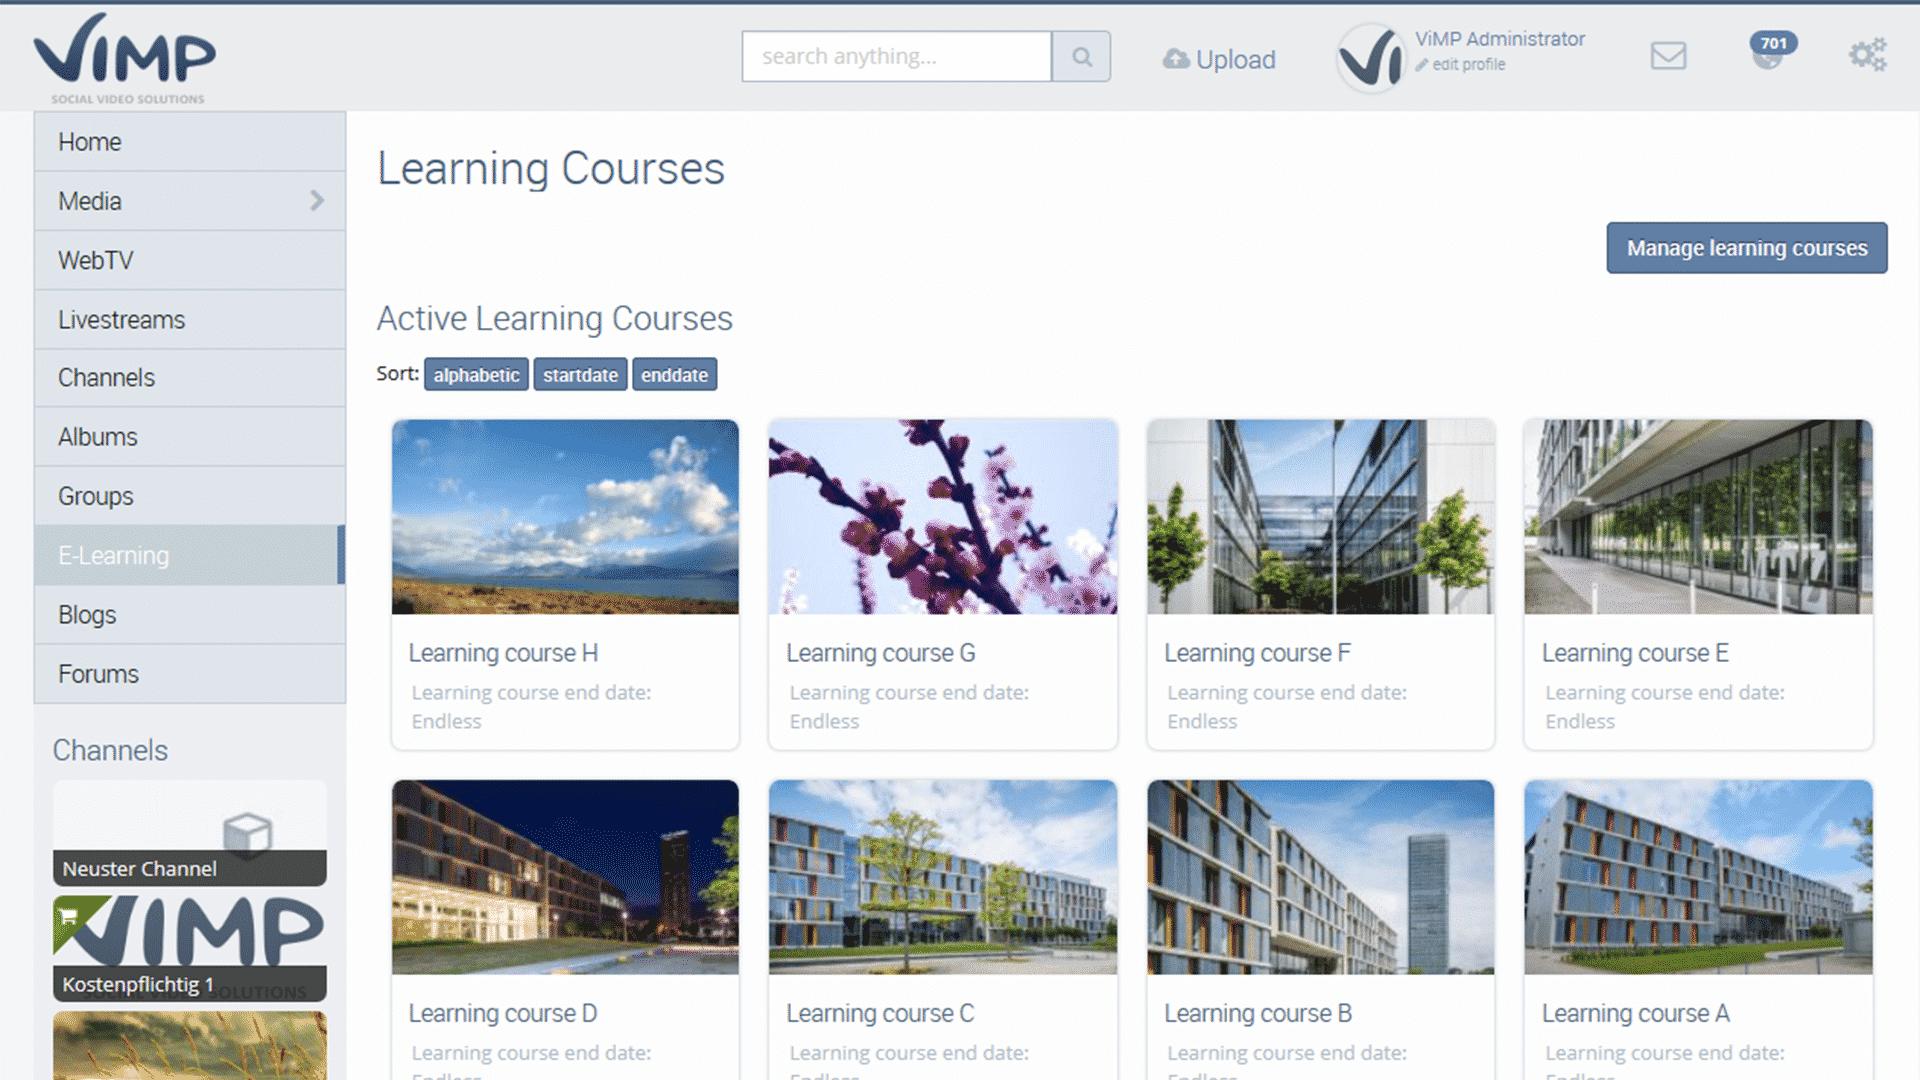 vimp_learning